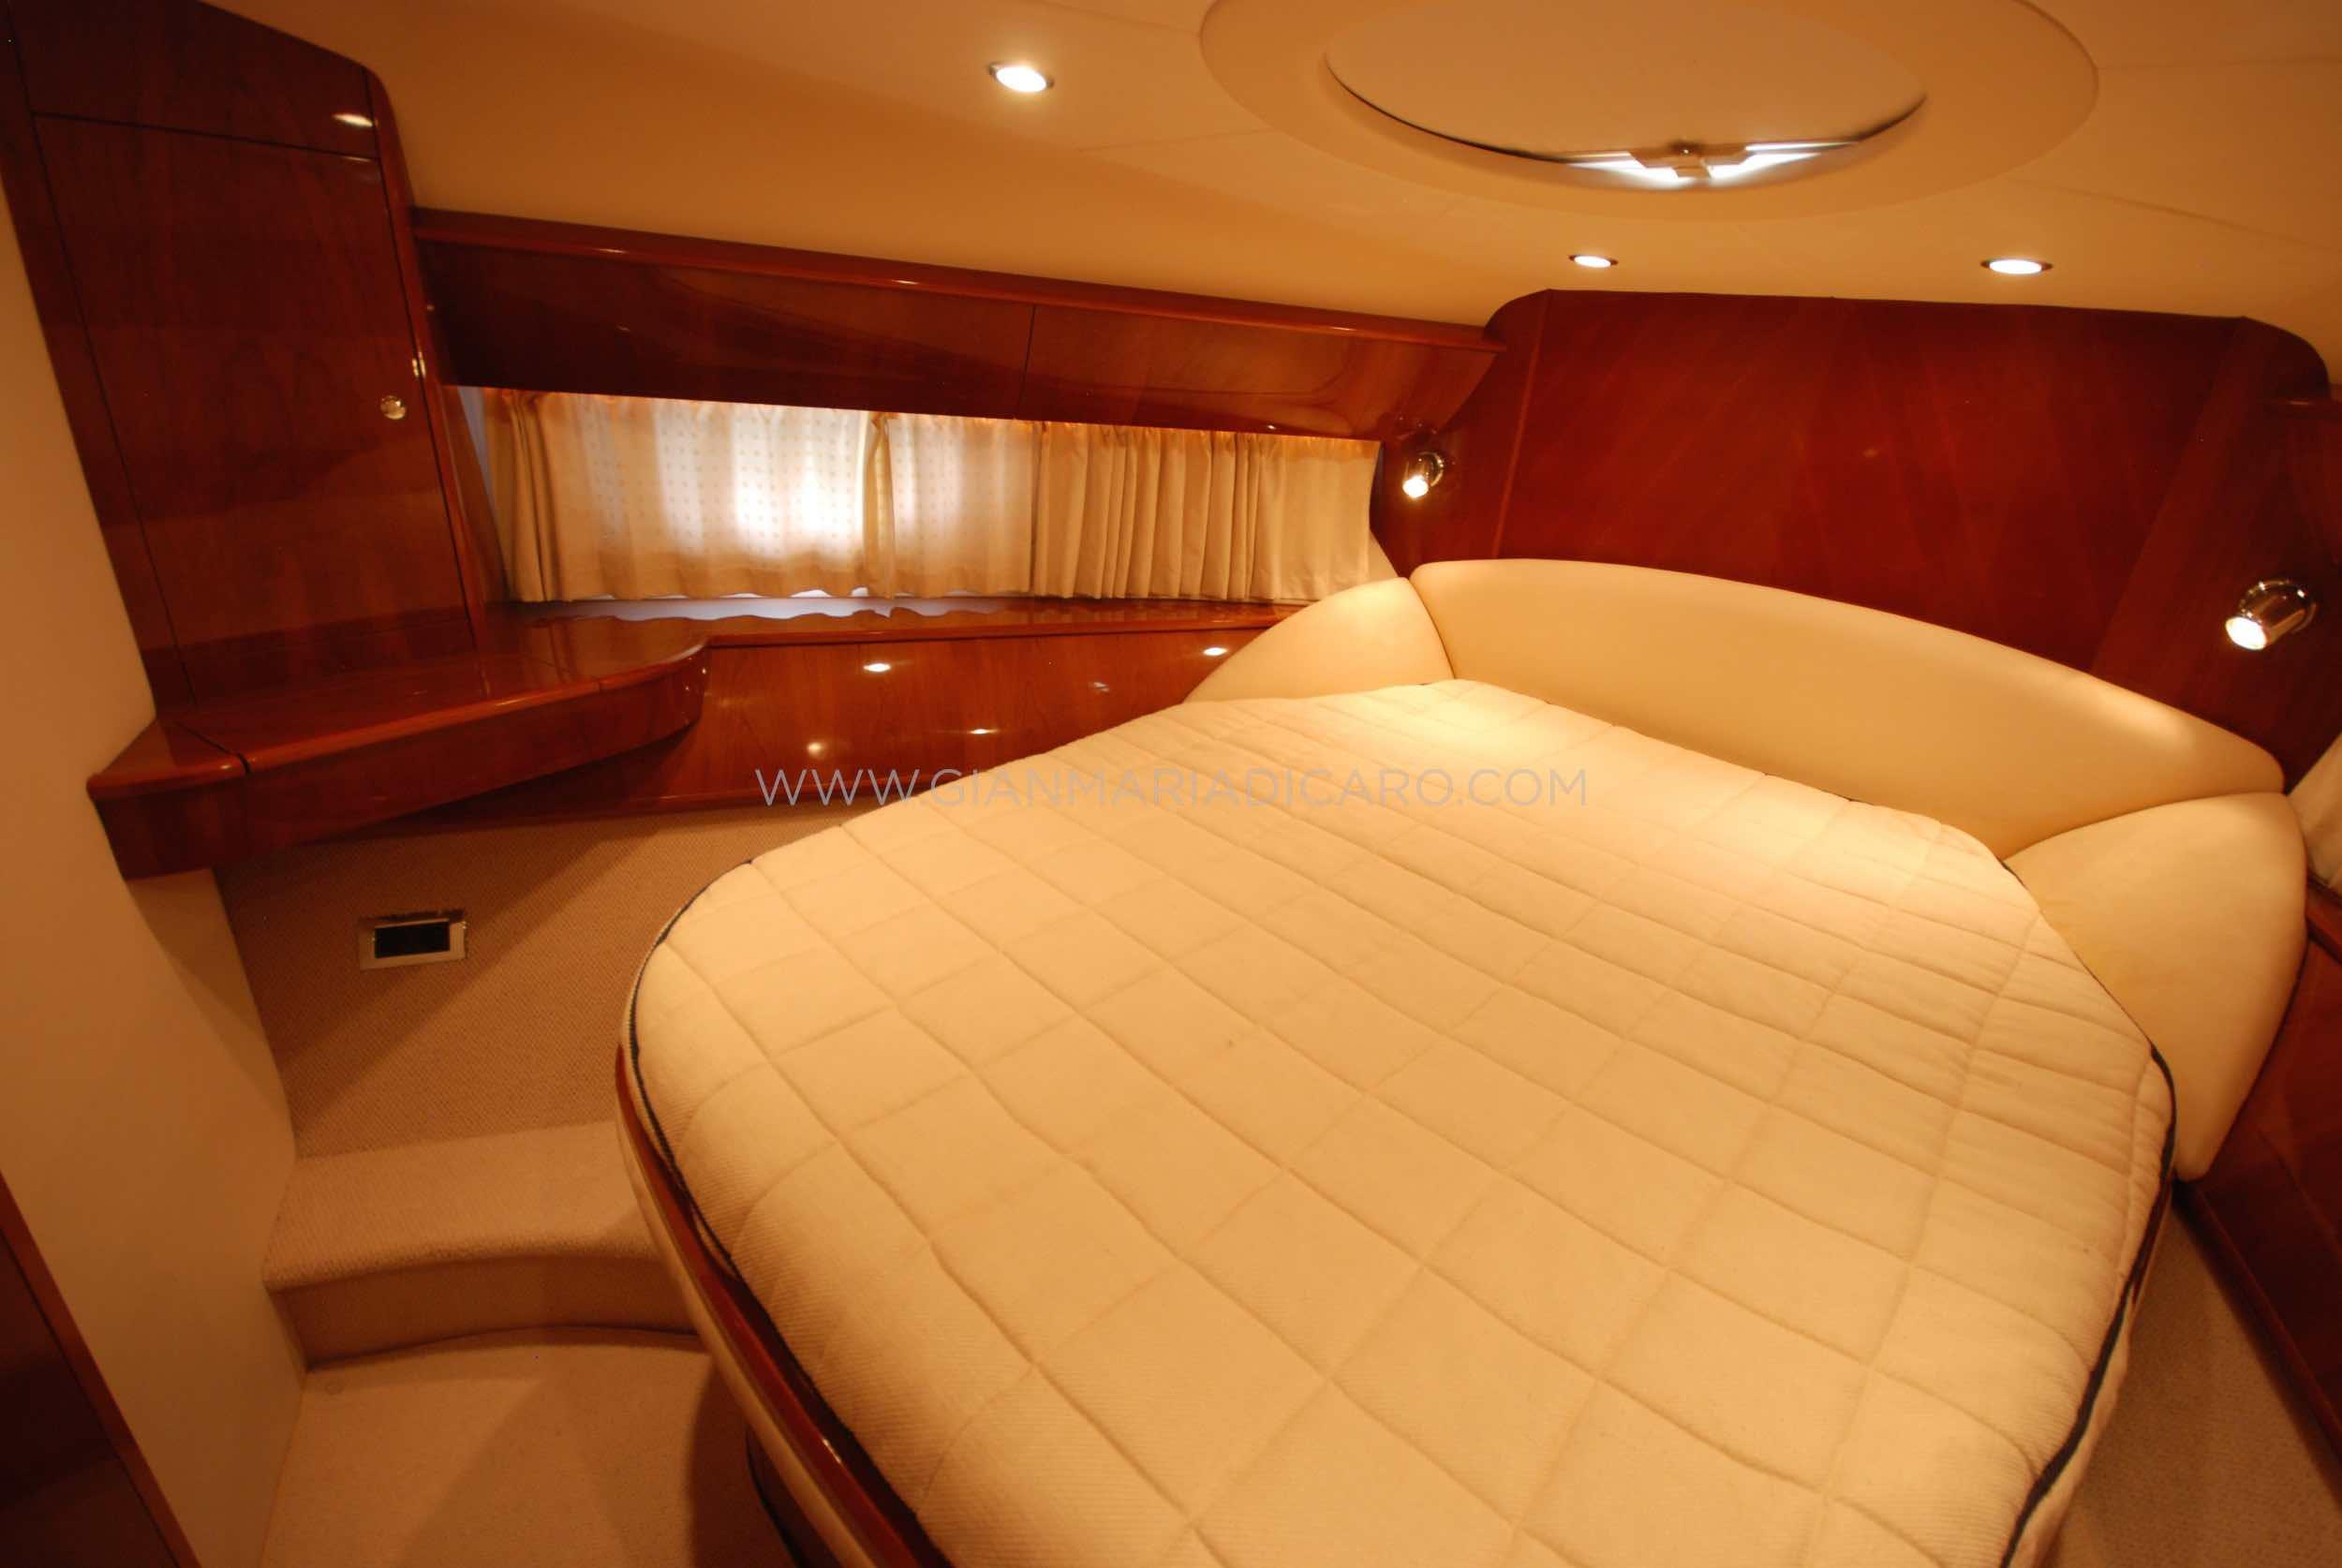 princess-yachts-v58-maestro-di-vita-for-sale-14.jpg